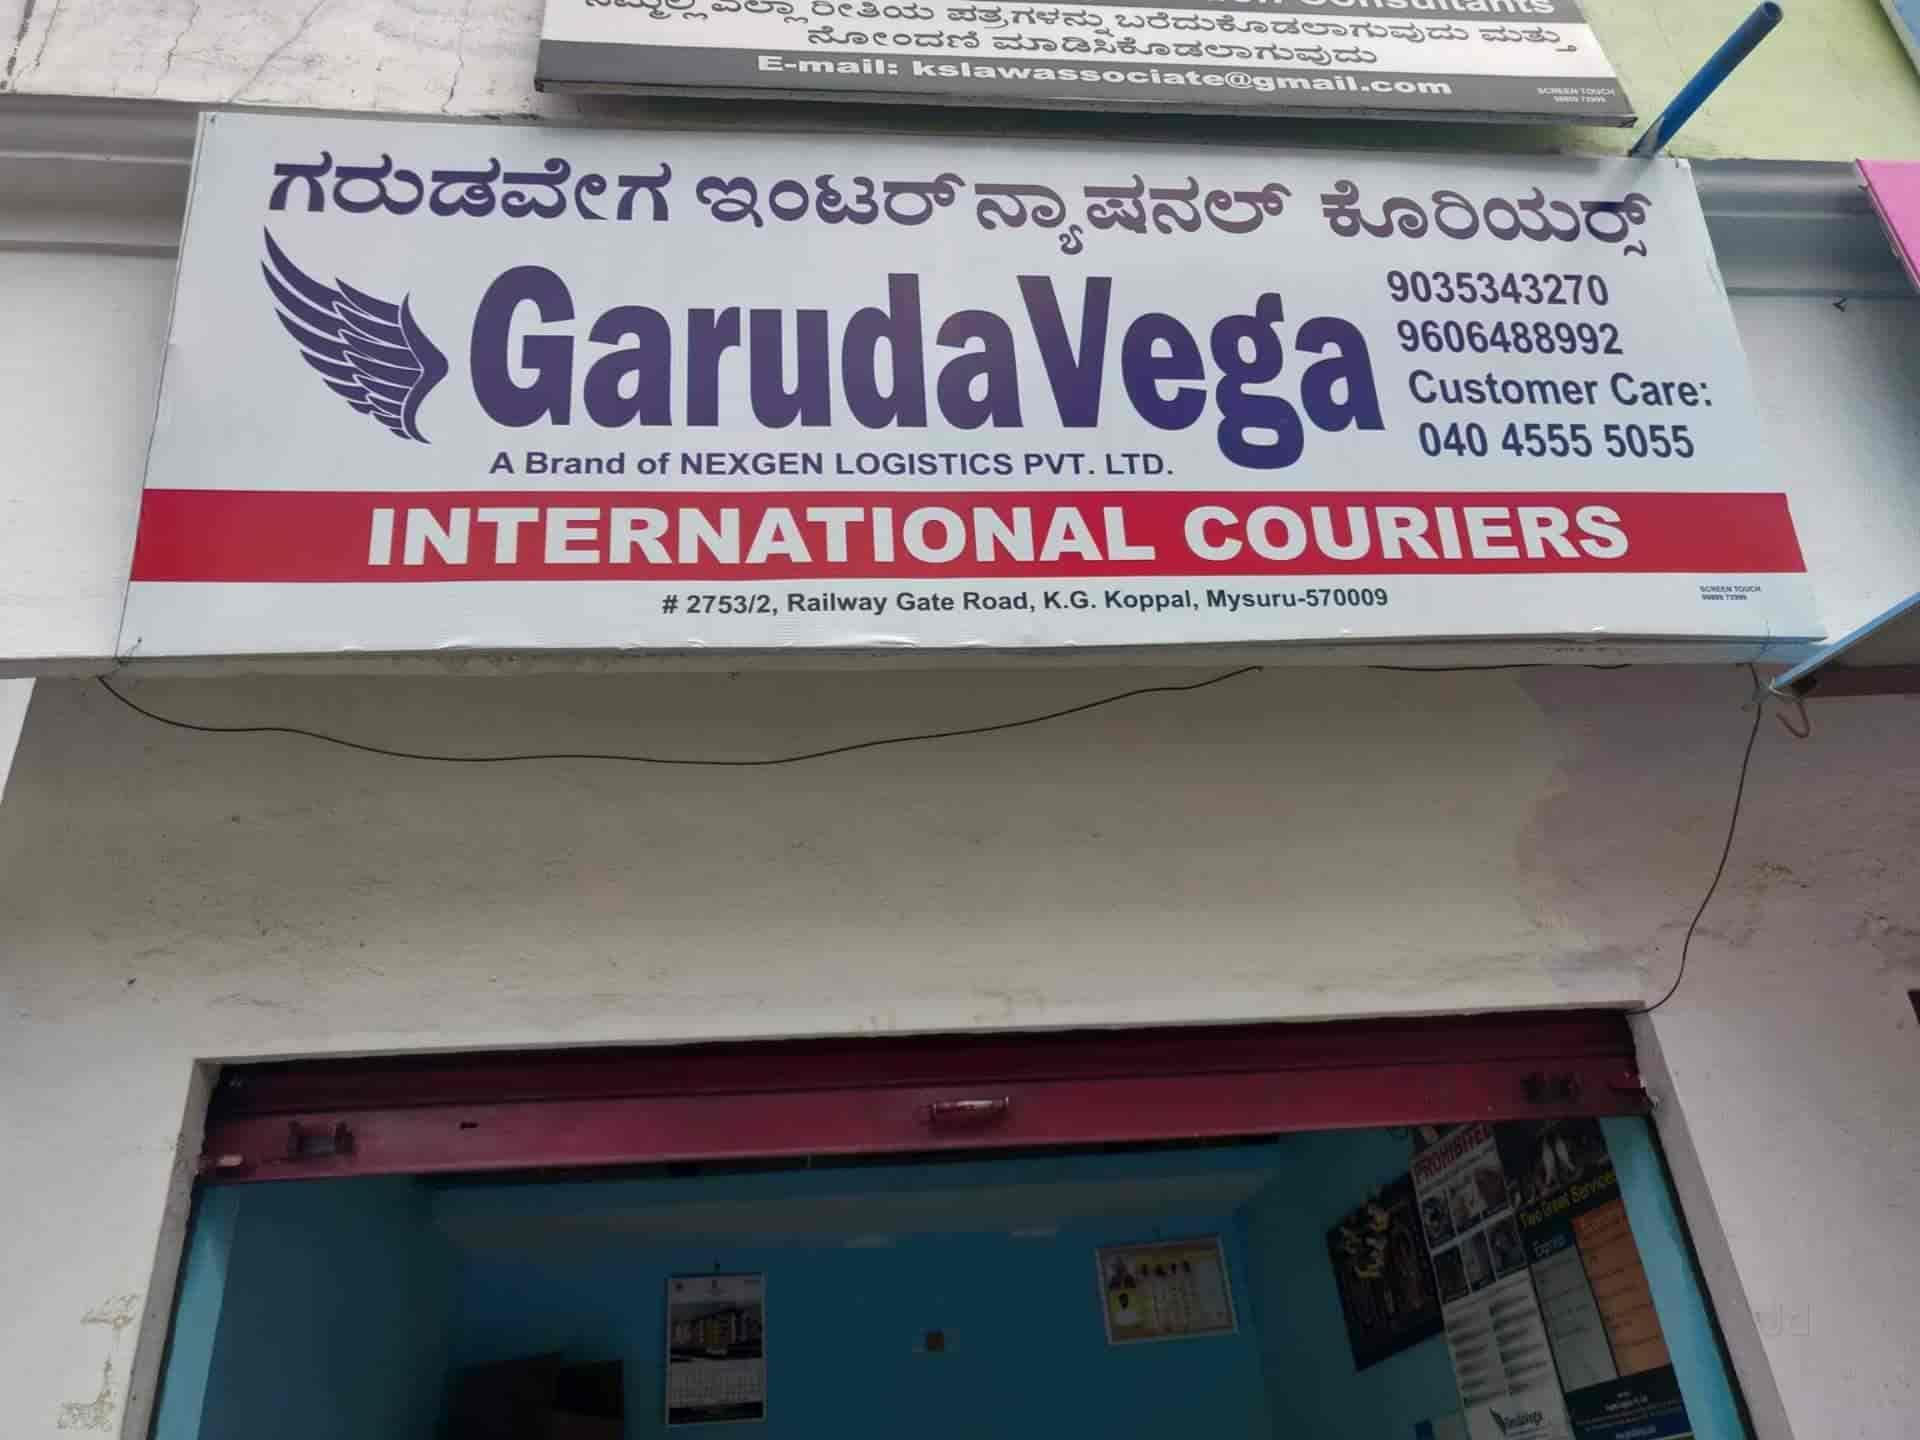 Garuda Vega International Couries, Saraswathipuram - Courier